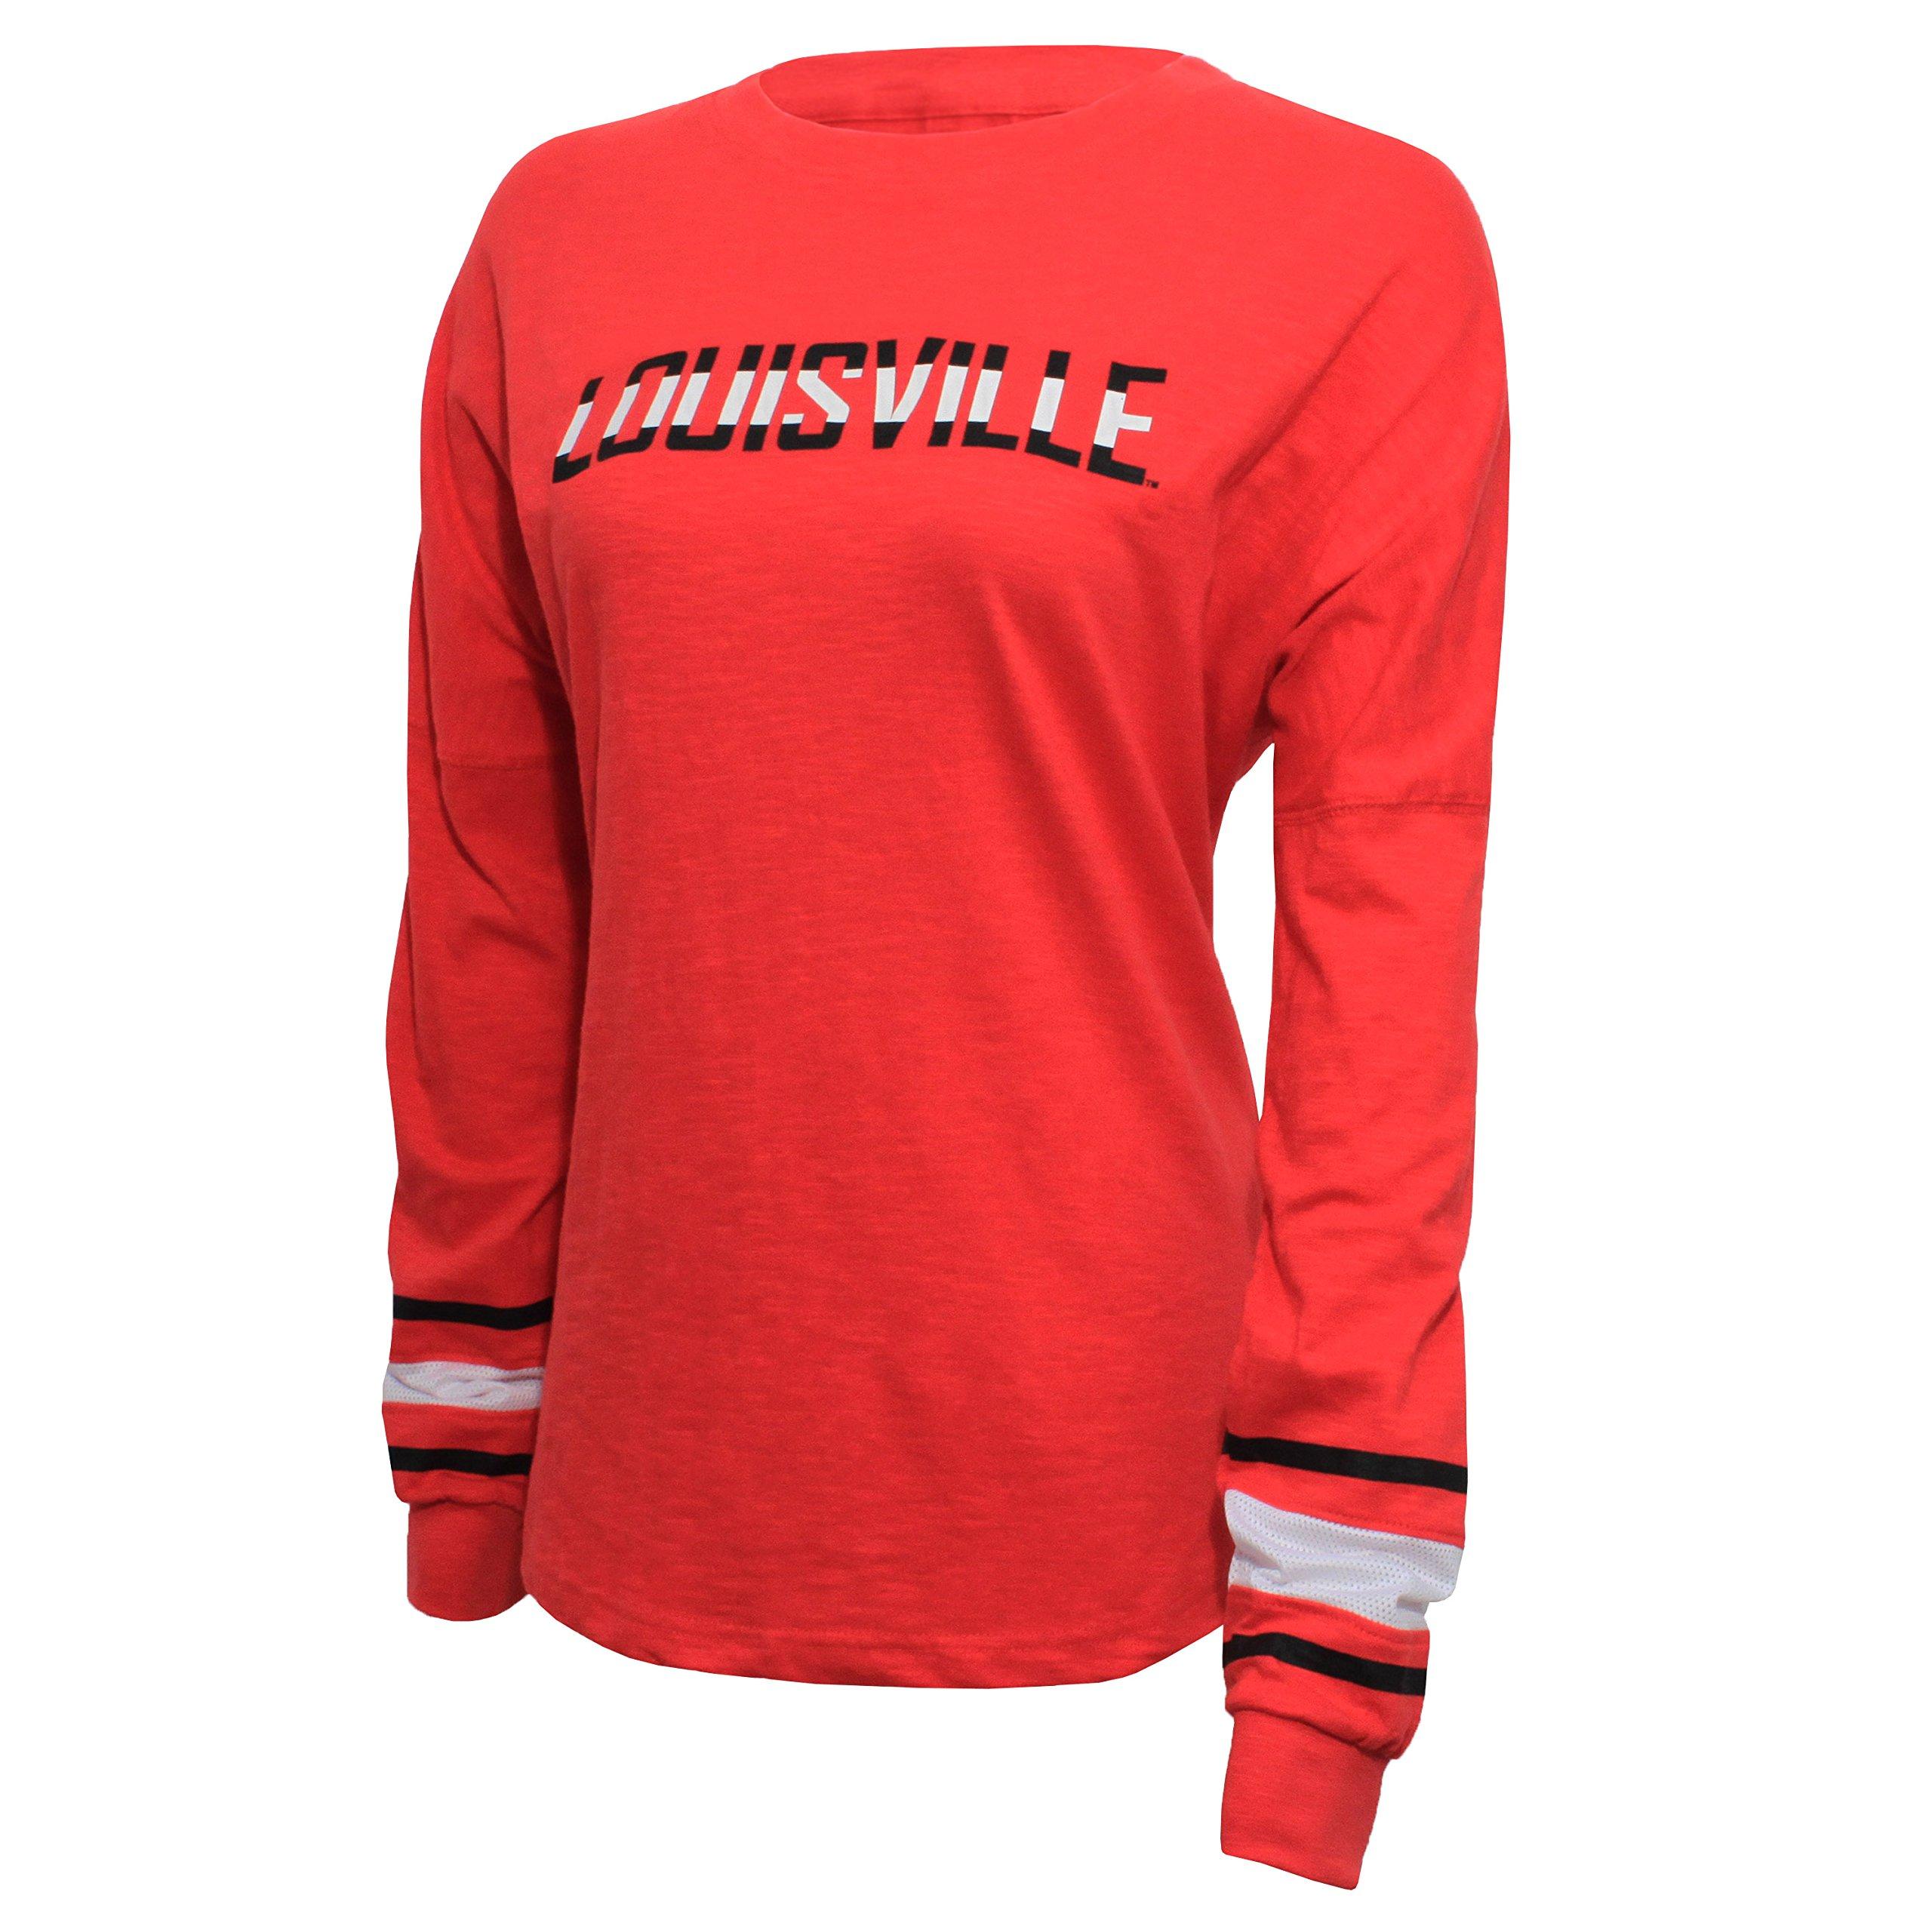 NCAA Louisville Cardinals Women's Campus Specialties Long Sleeve Fan Tee, Large, Red